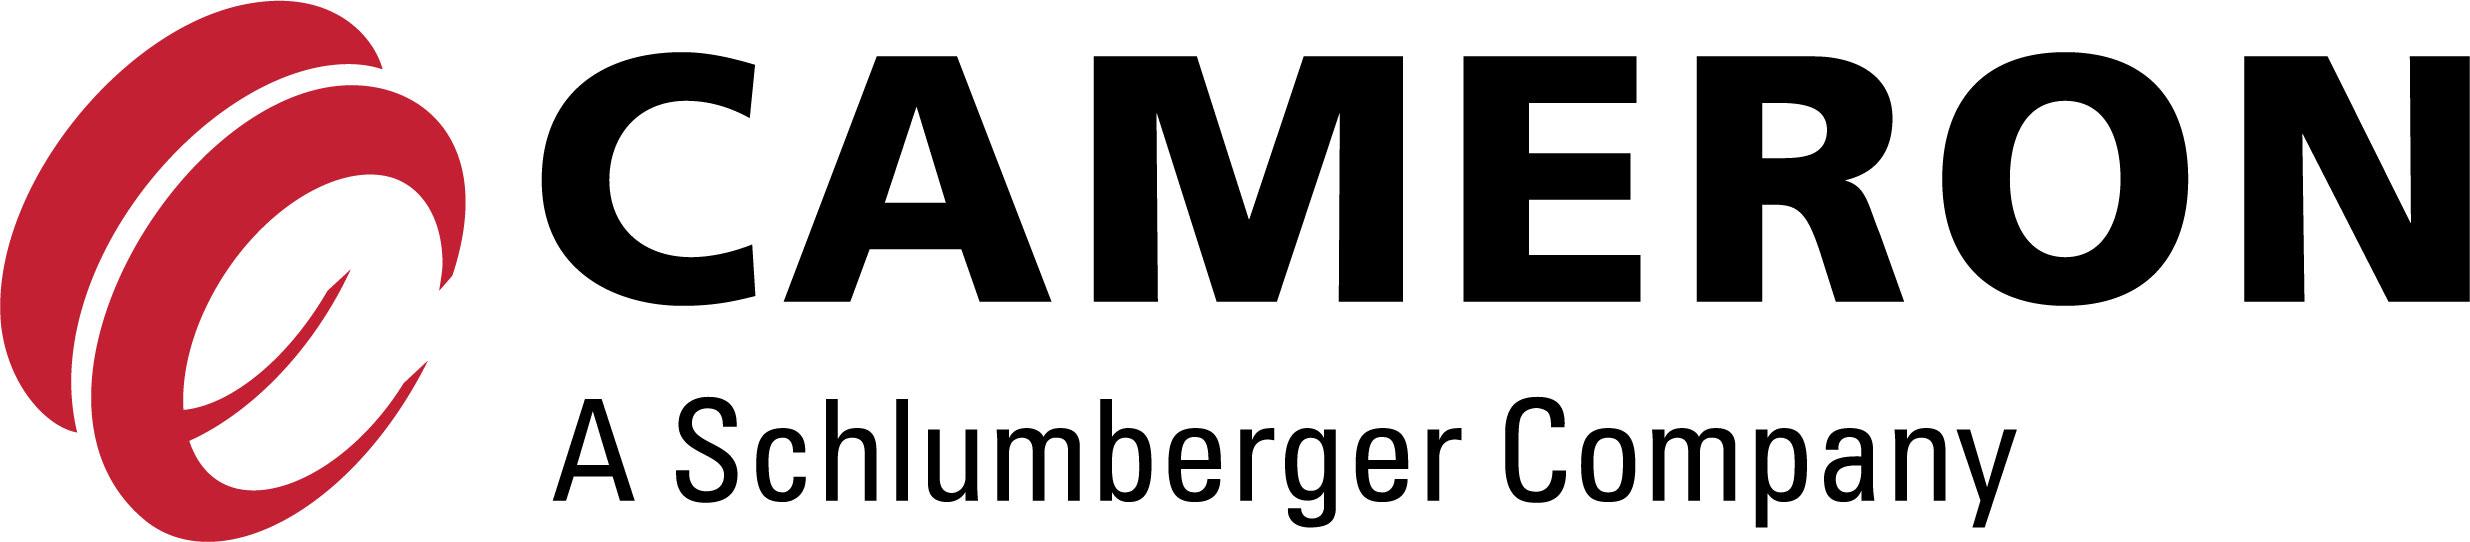 Cameron-01.jpg